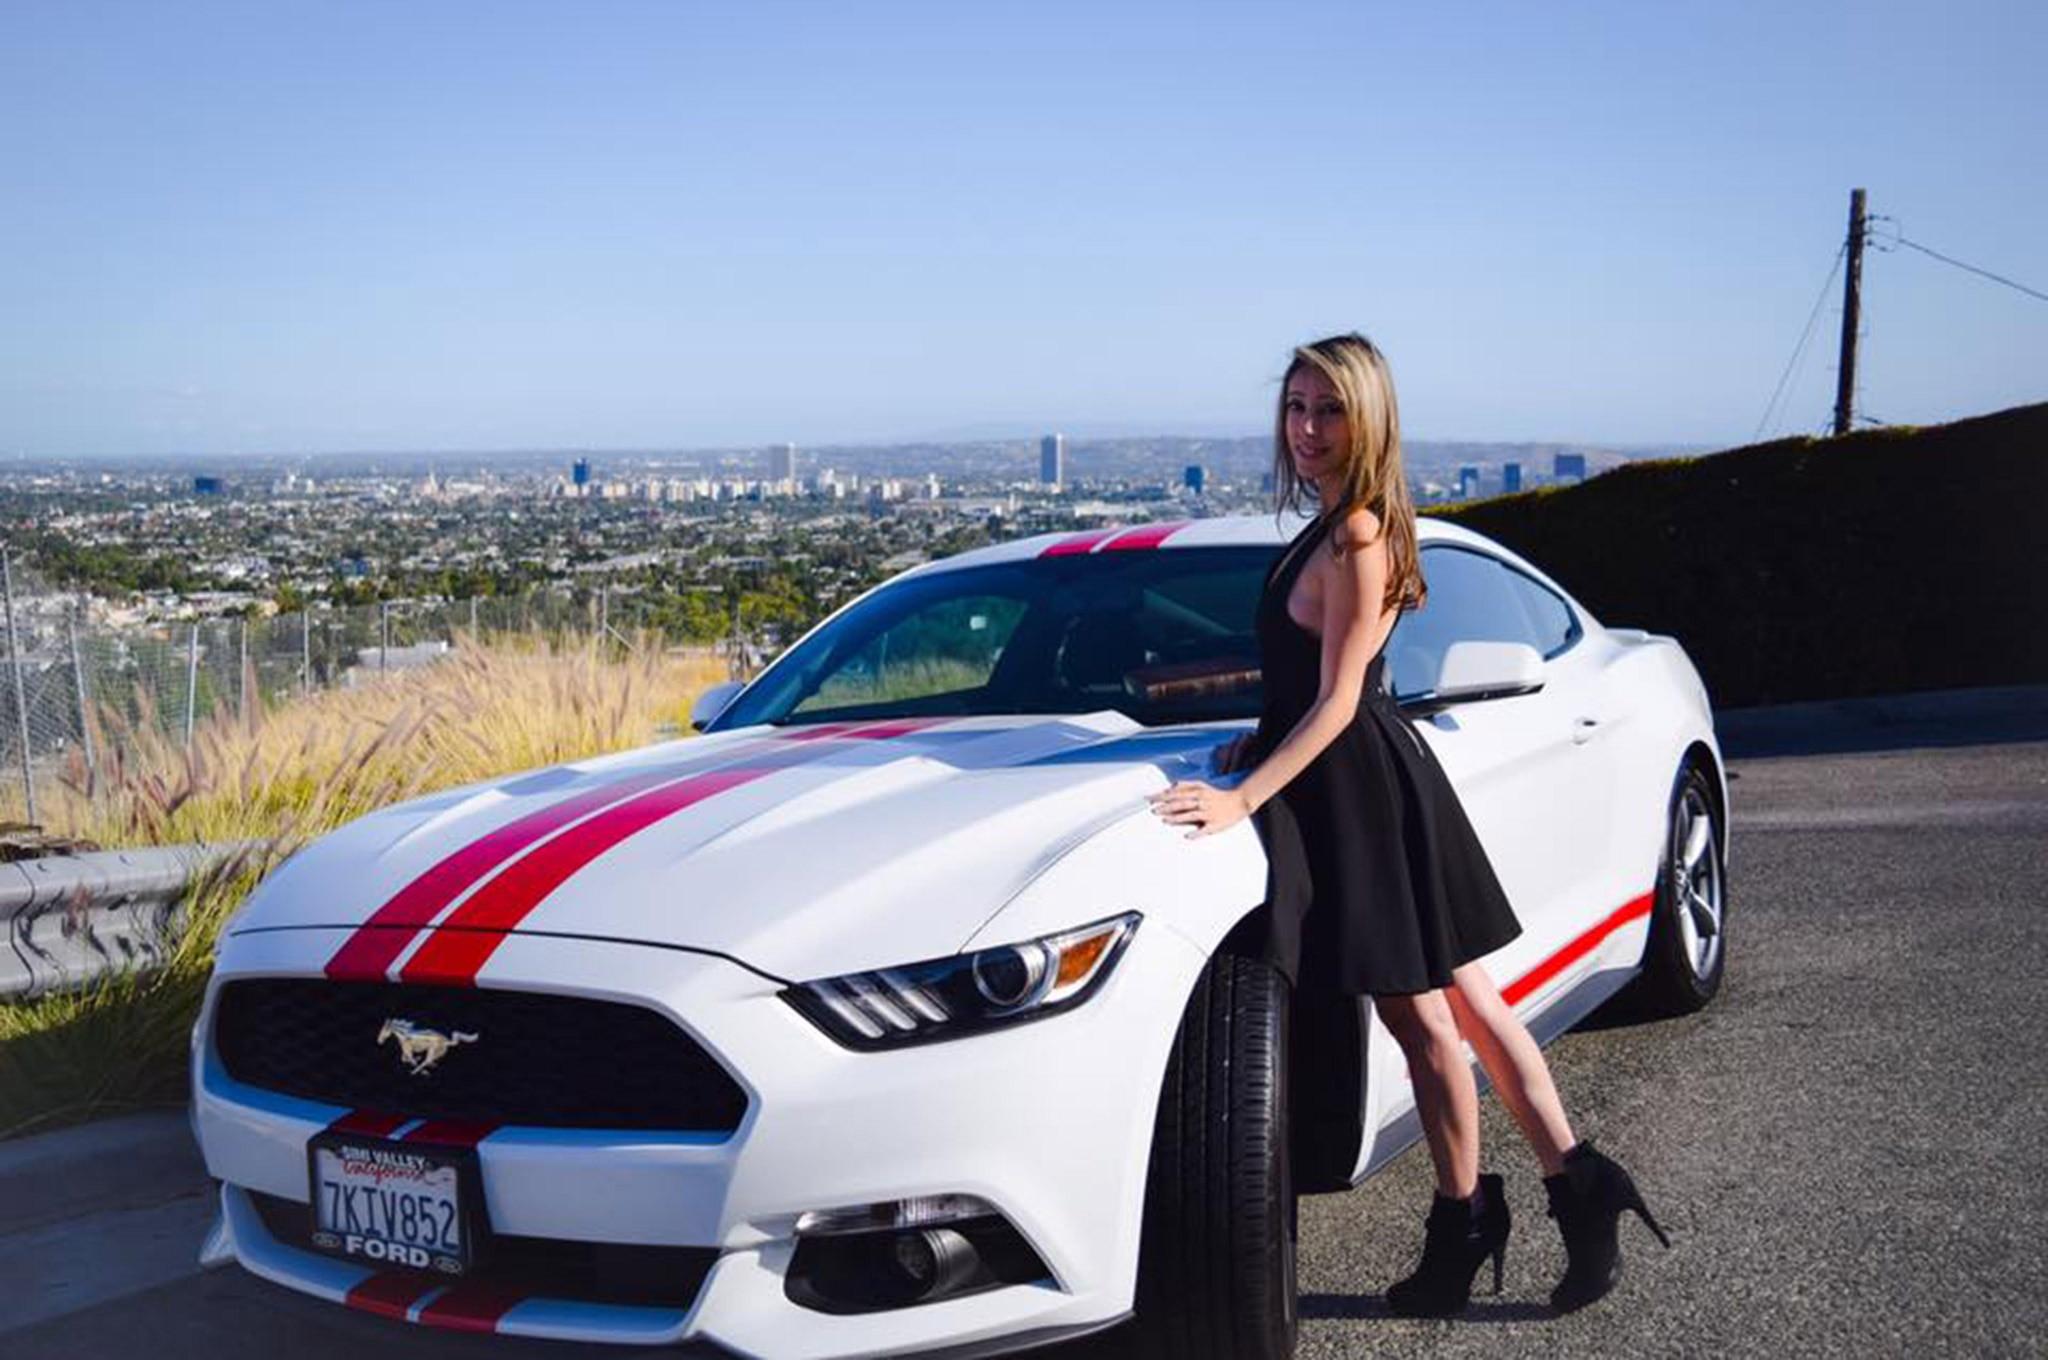 2015 Ford Mustang Mimi Estrada White Red Stripes 001